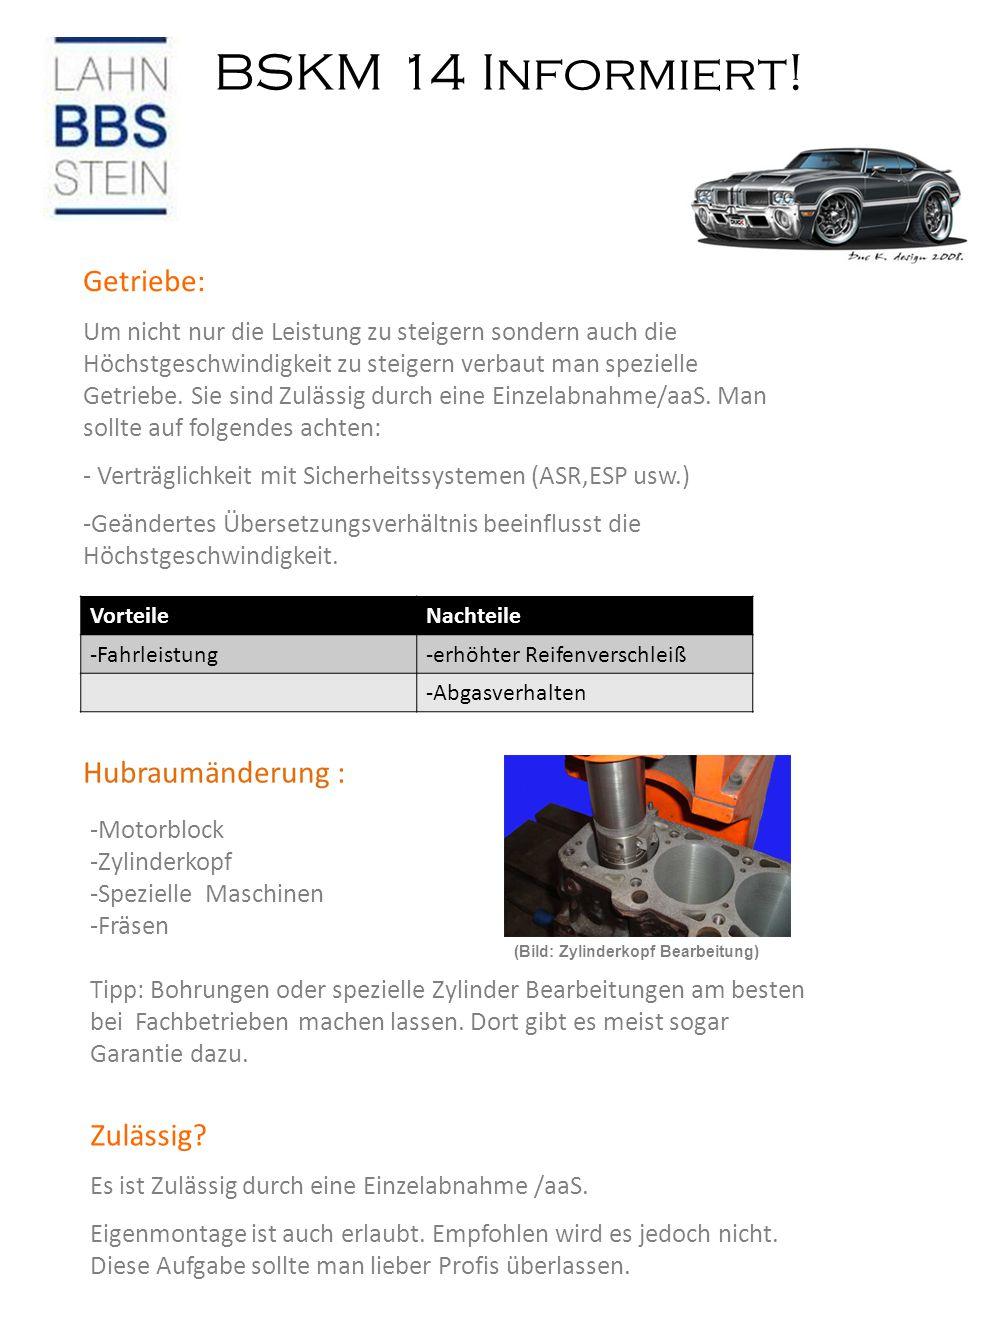 BSKM 14 Informiert! -Motorblock -Zylinderkopf -Spezielle Maschinen -Fräsen Tipp: Bohrungen oder spezielle Zylinder Bearbeitungen am besten bei Fachbet